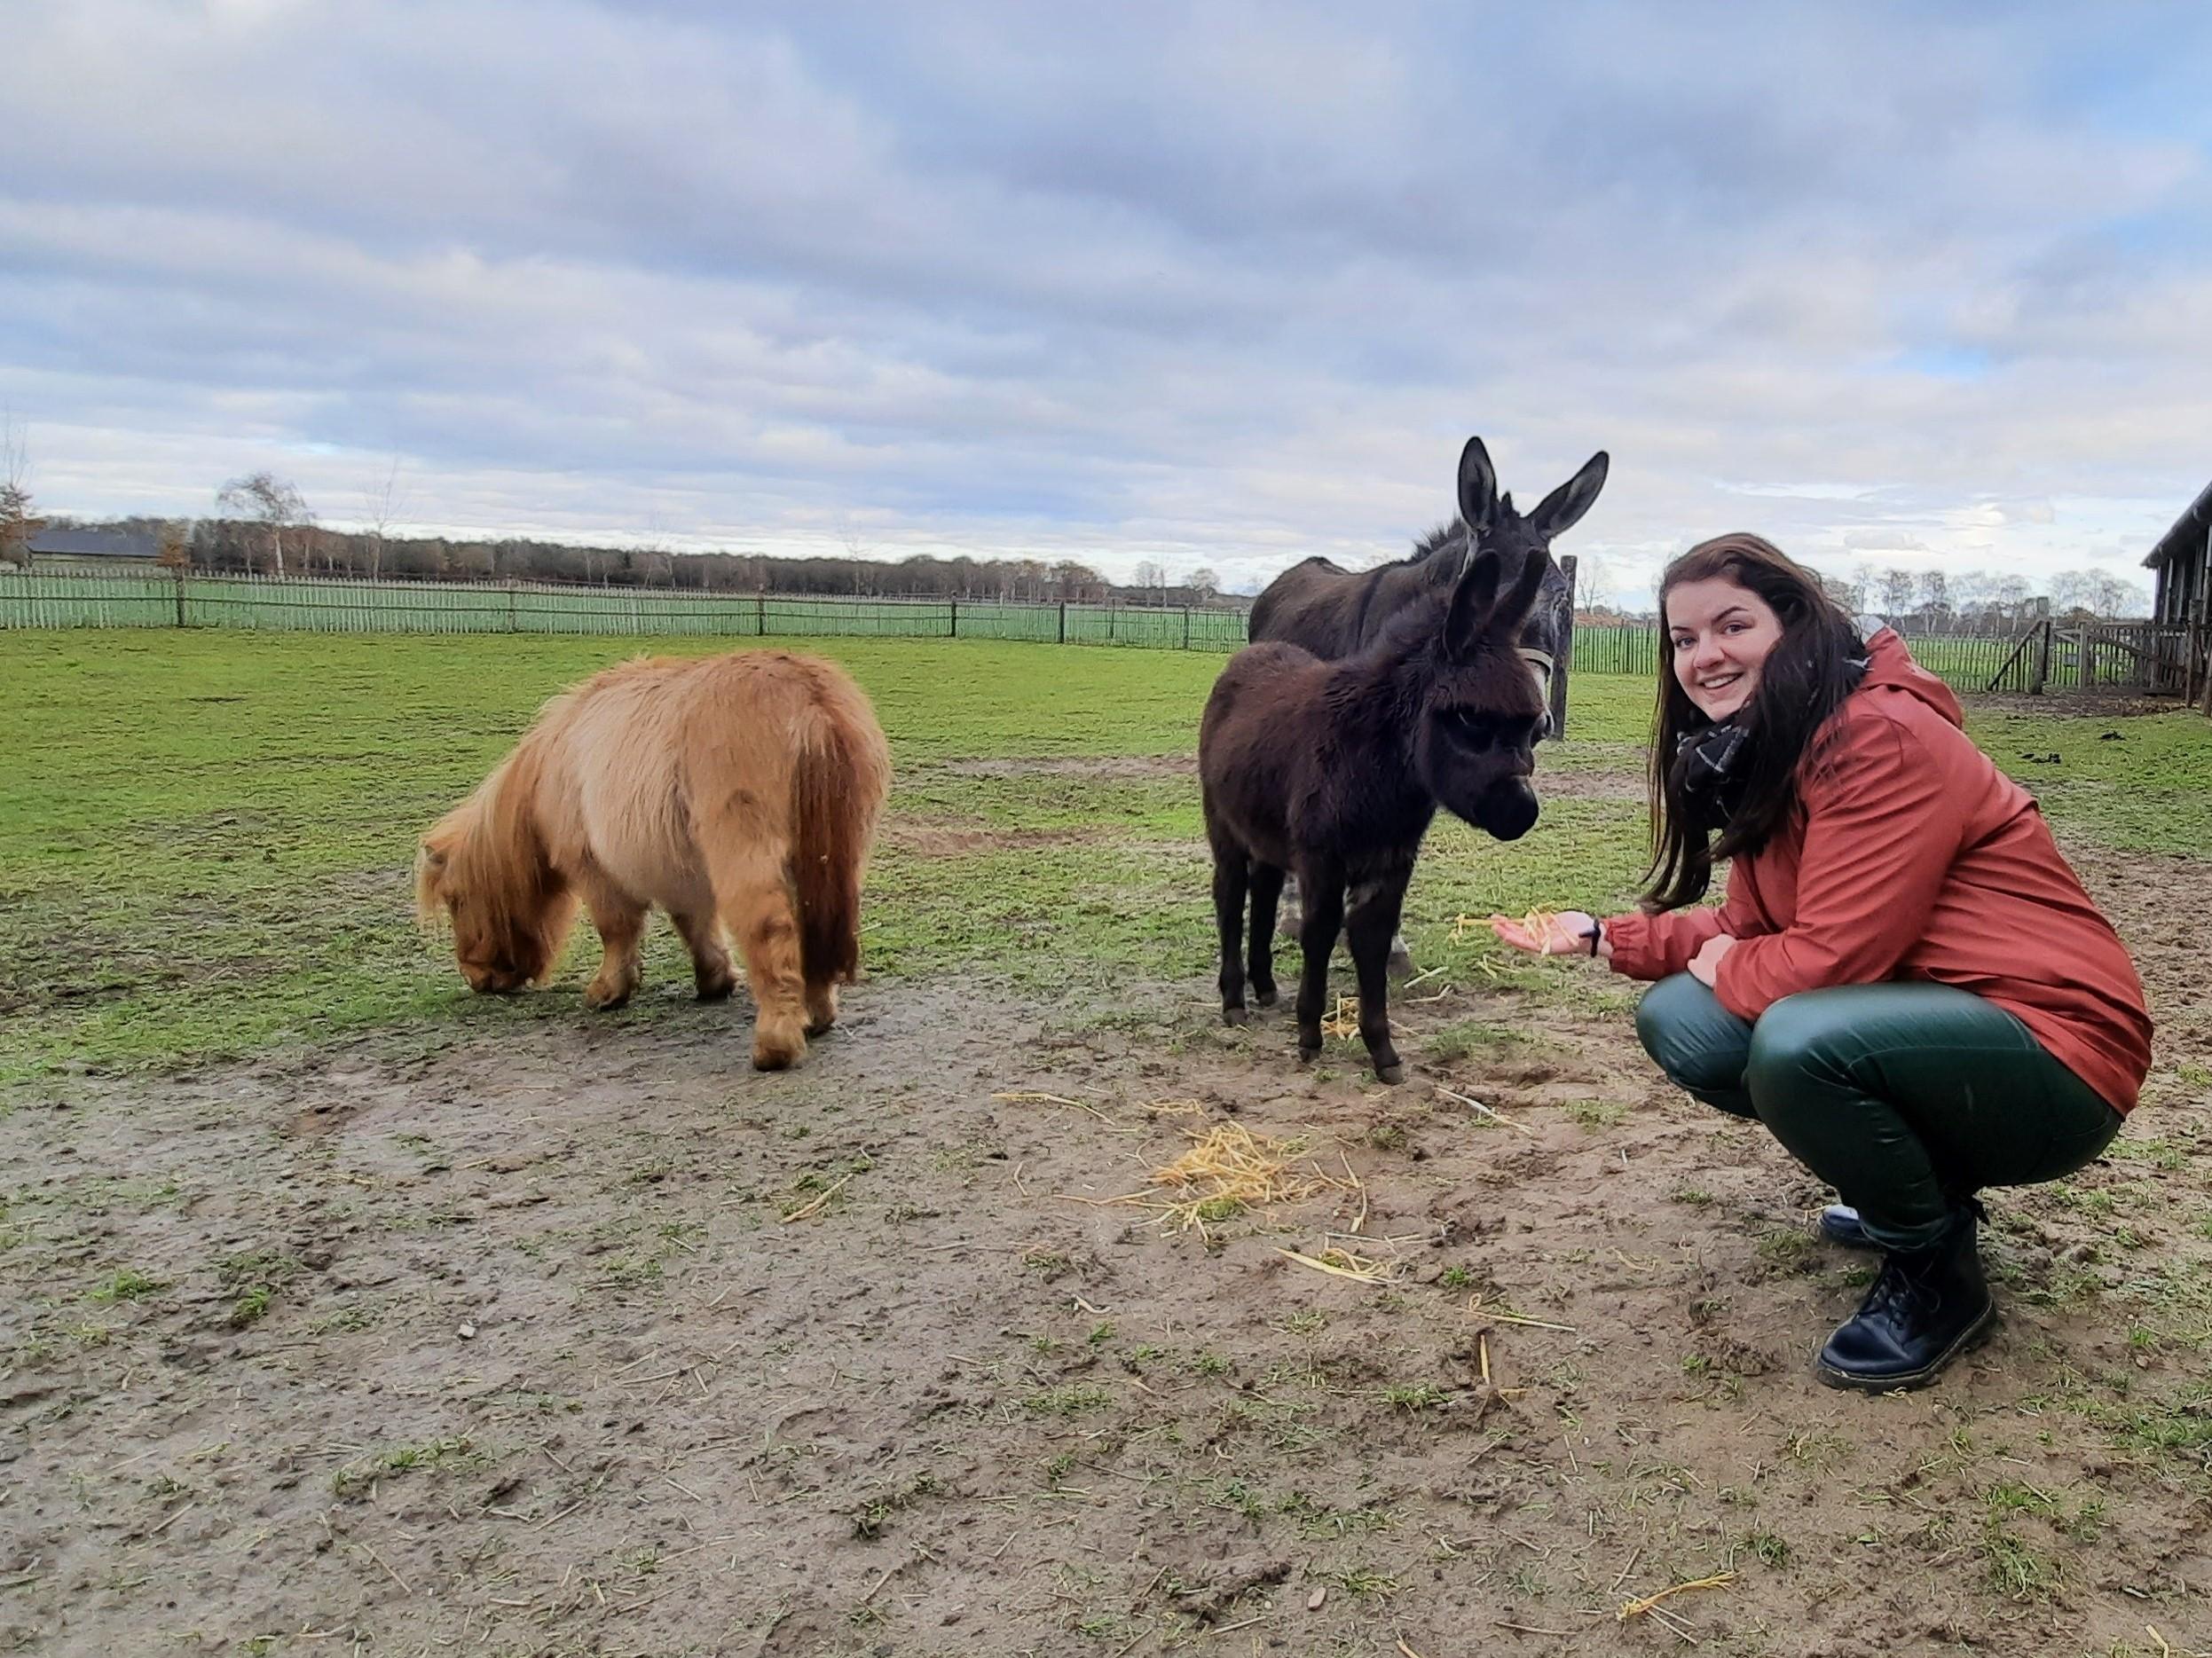 Rola kinderdagverblijf krakenburg boerderij son